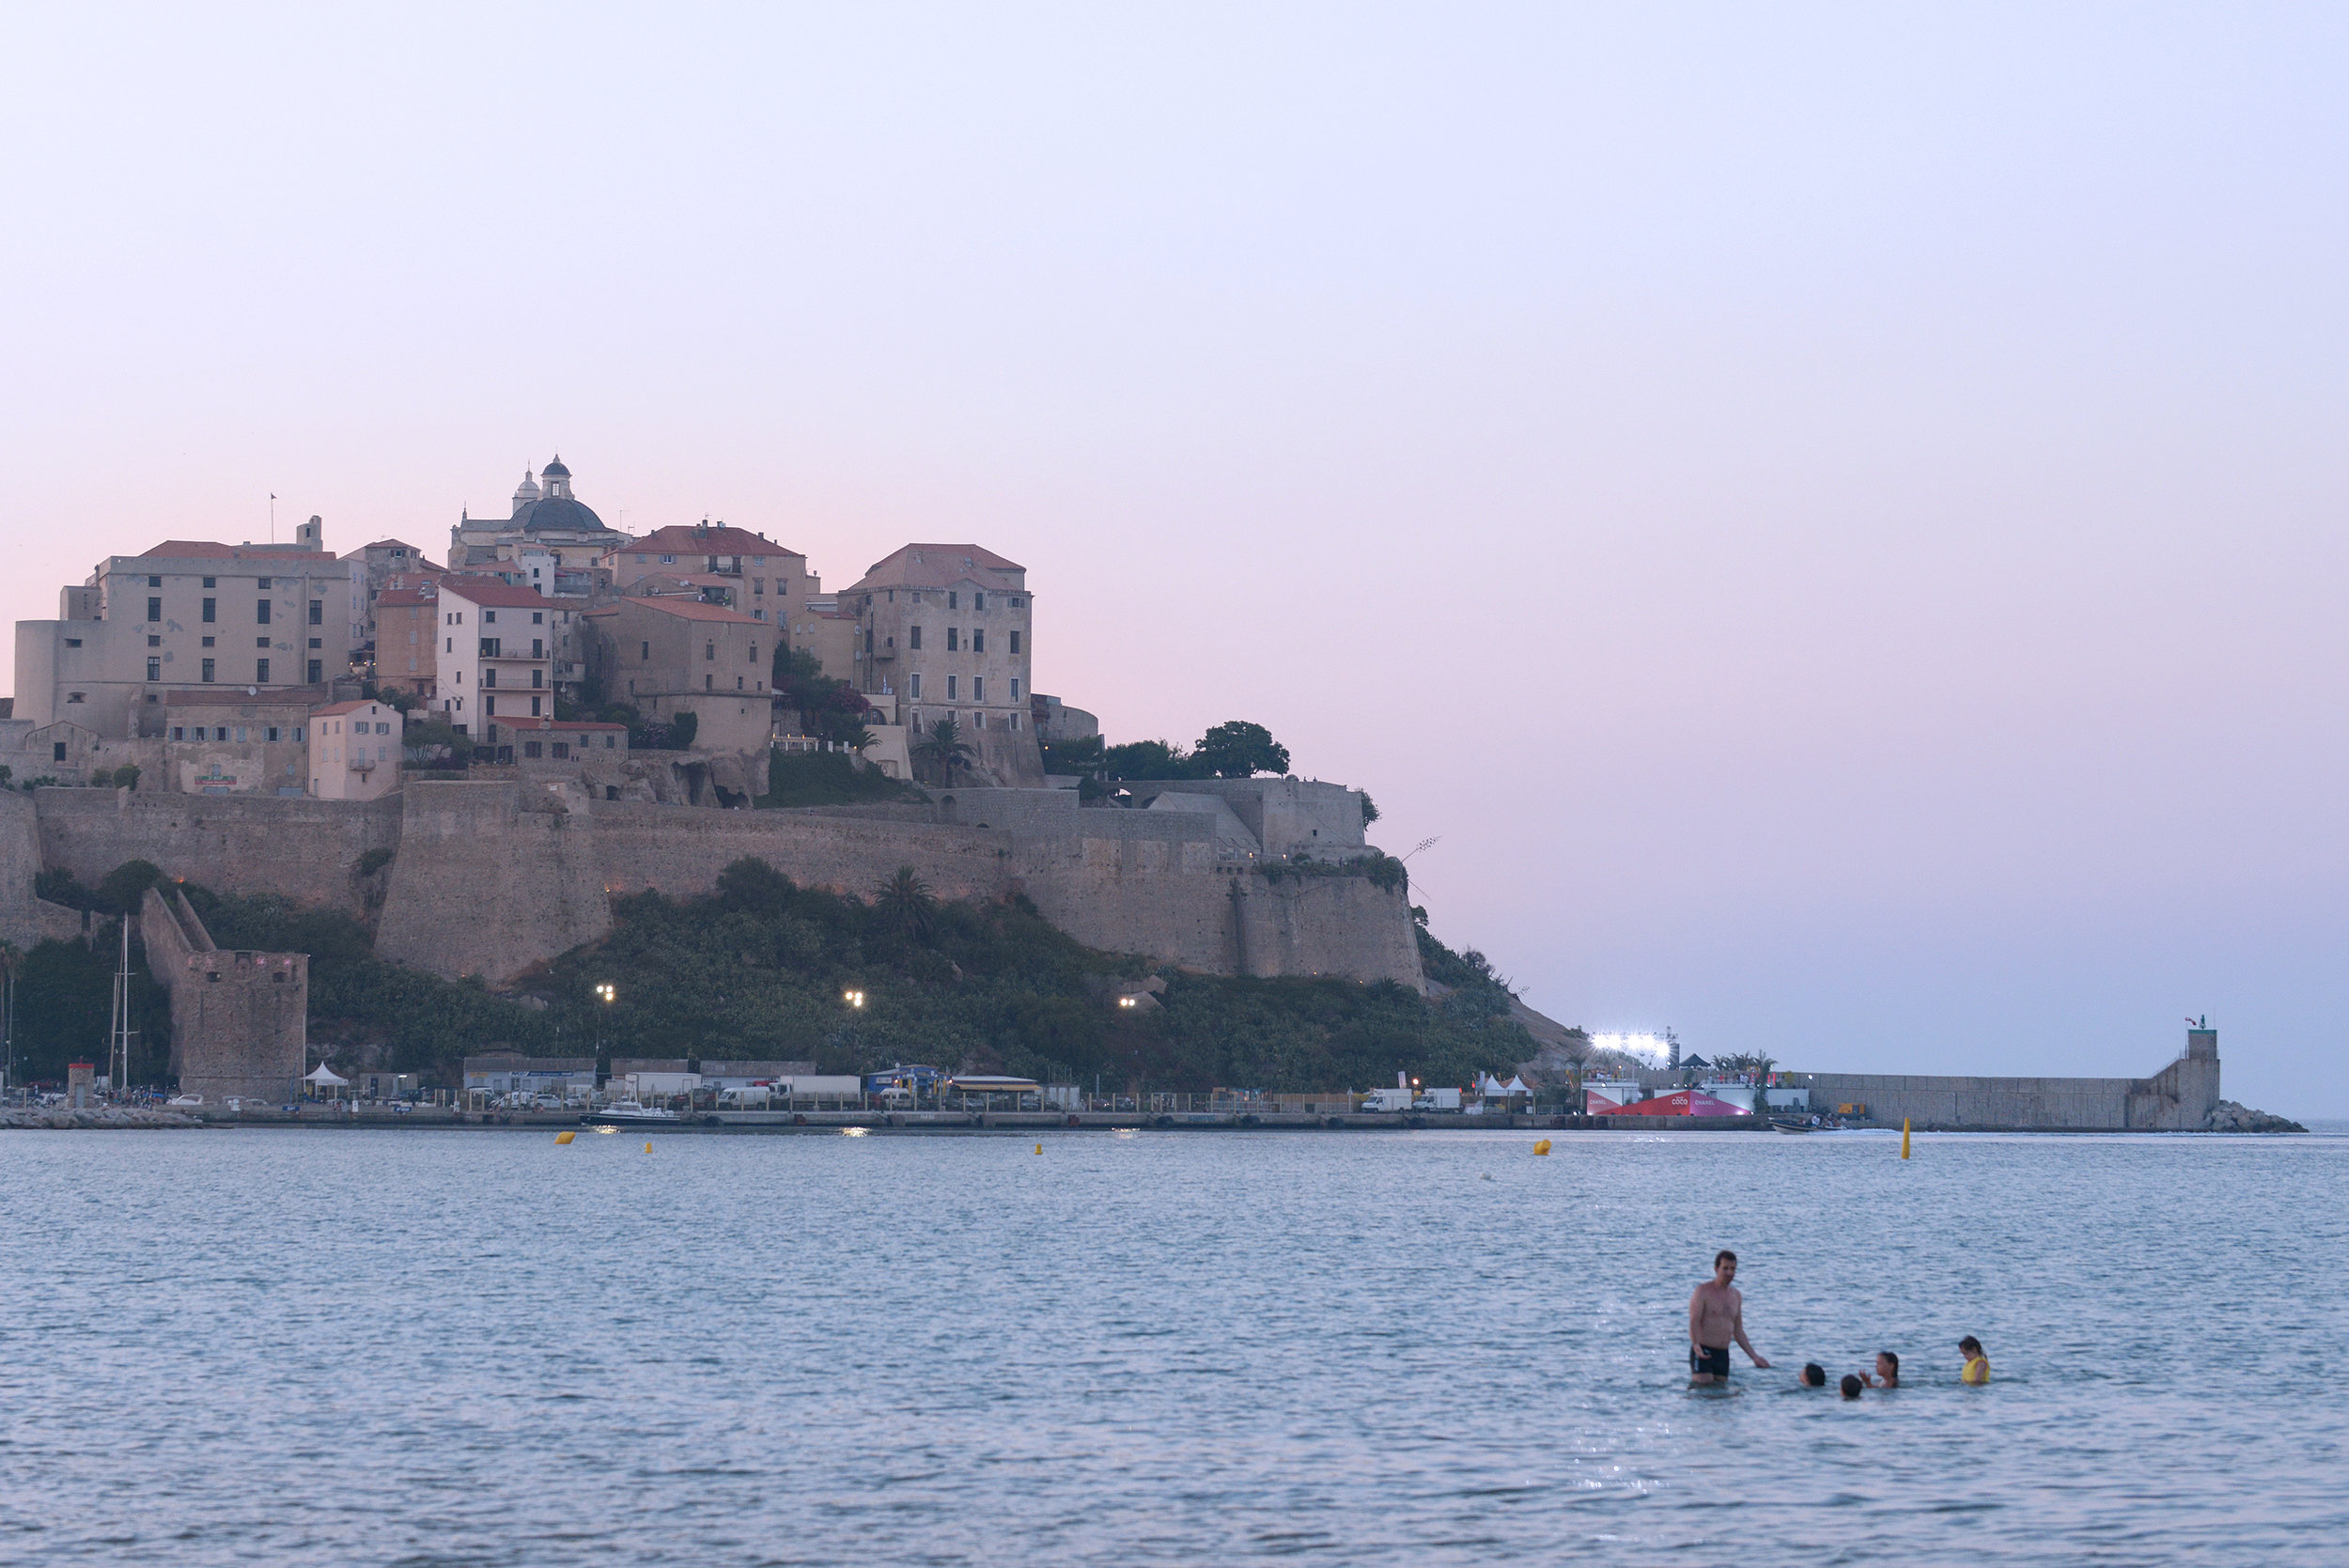 Ranska, Korsika, Calvia, matkablogi